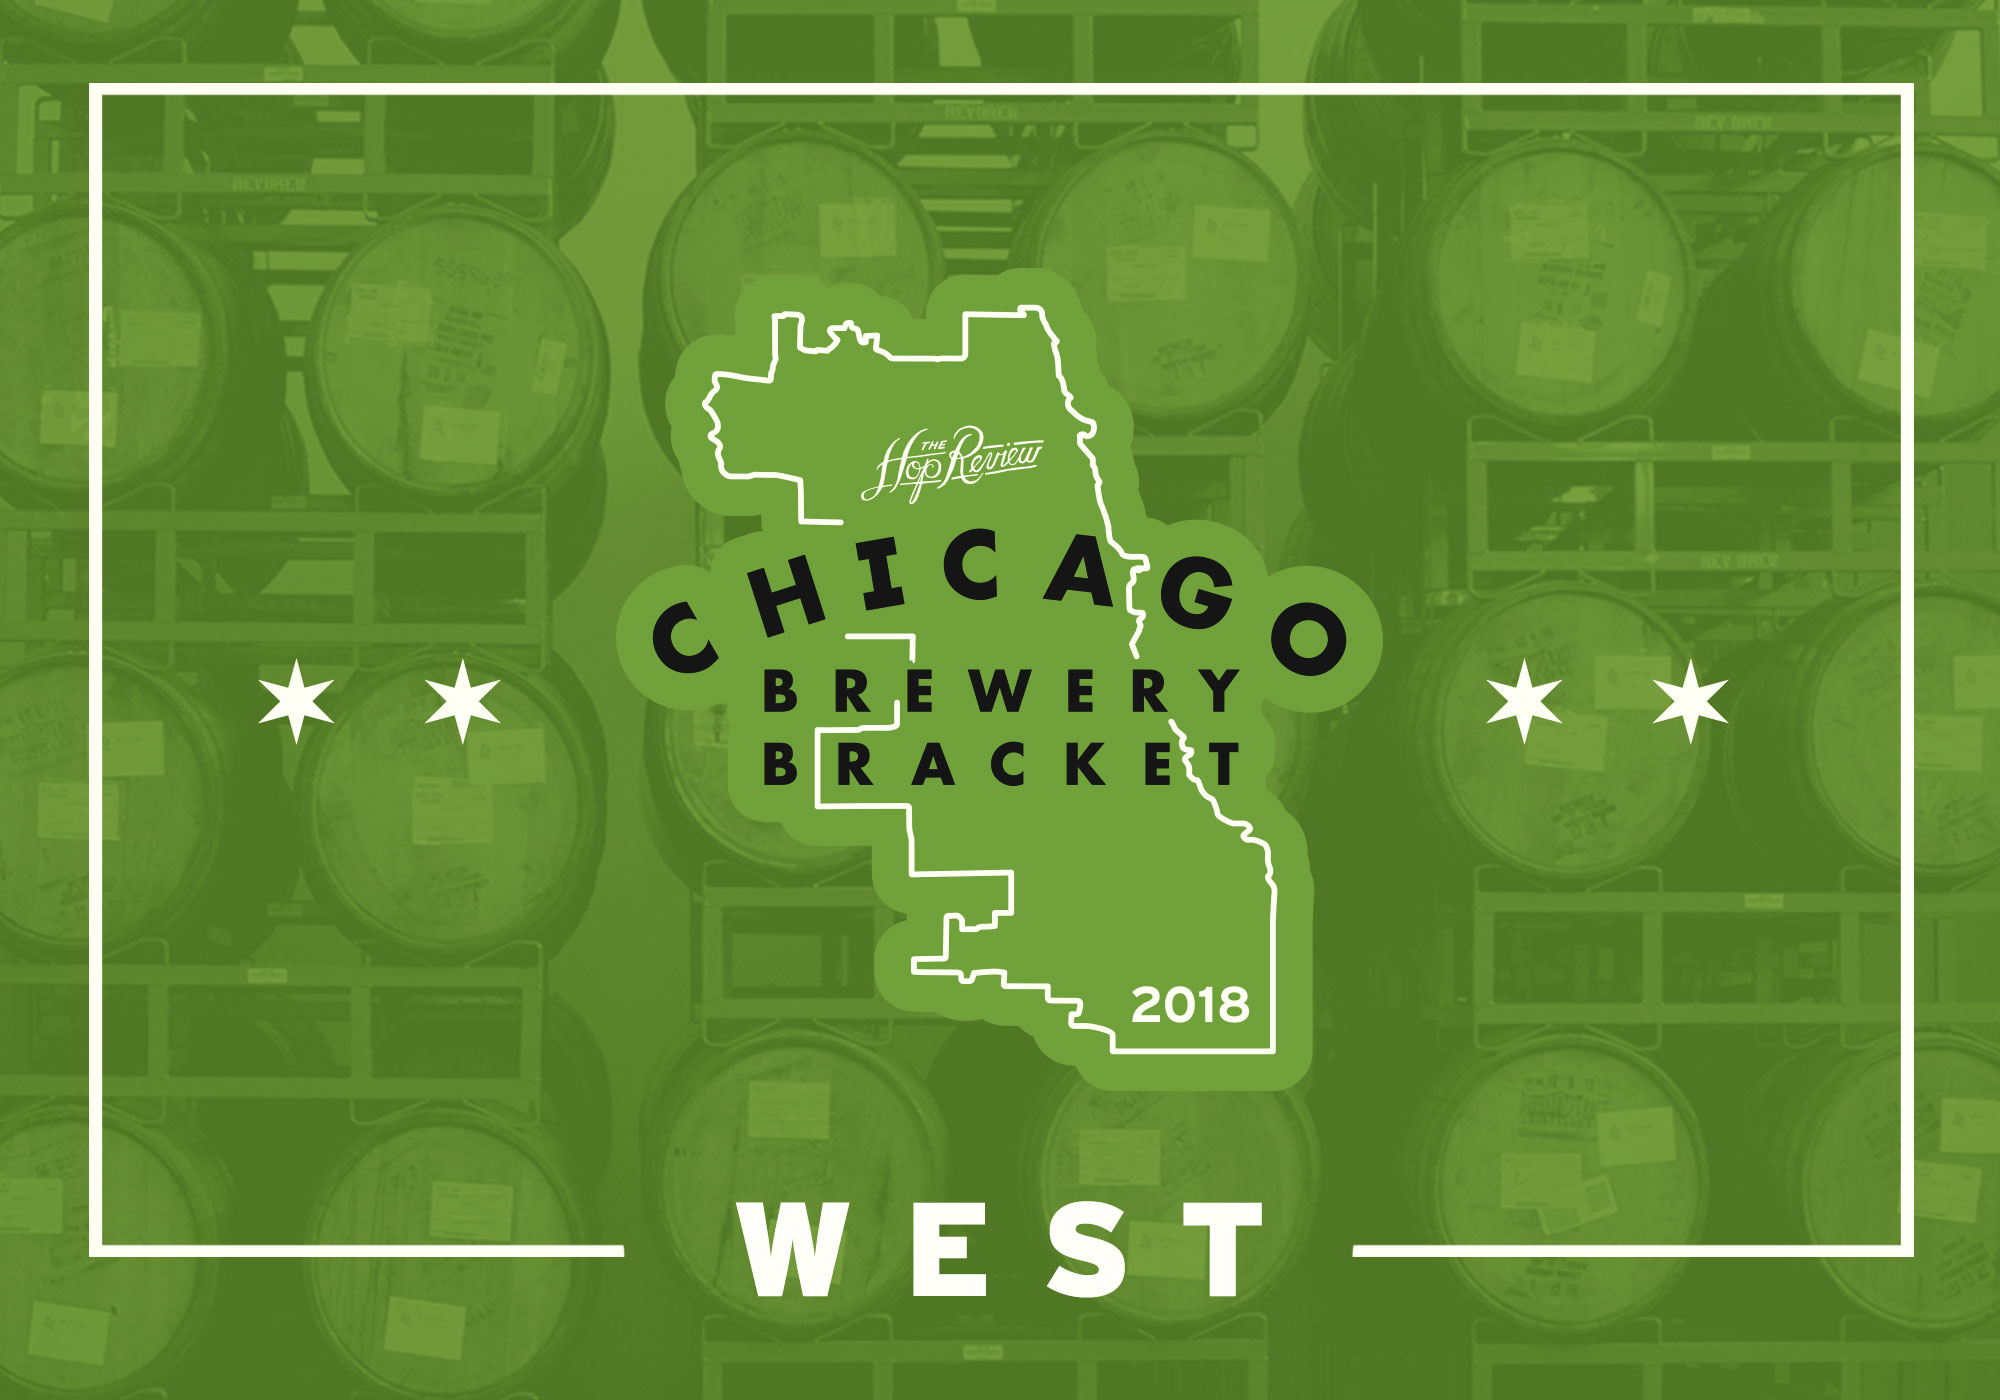 ChicagoBreweryBracket_2018_WEST.jpg